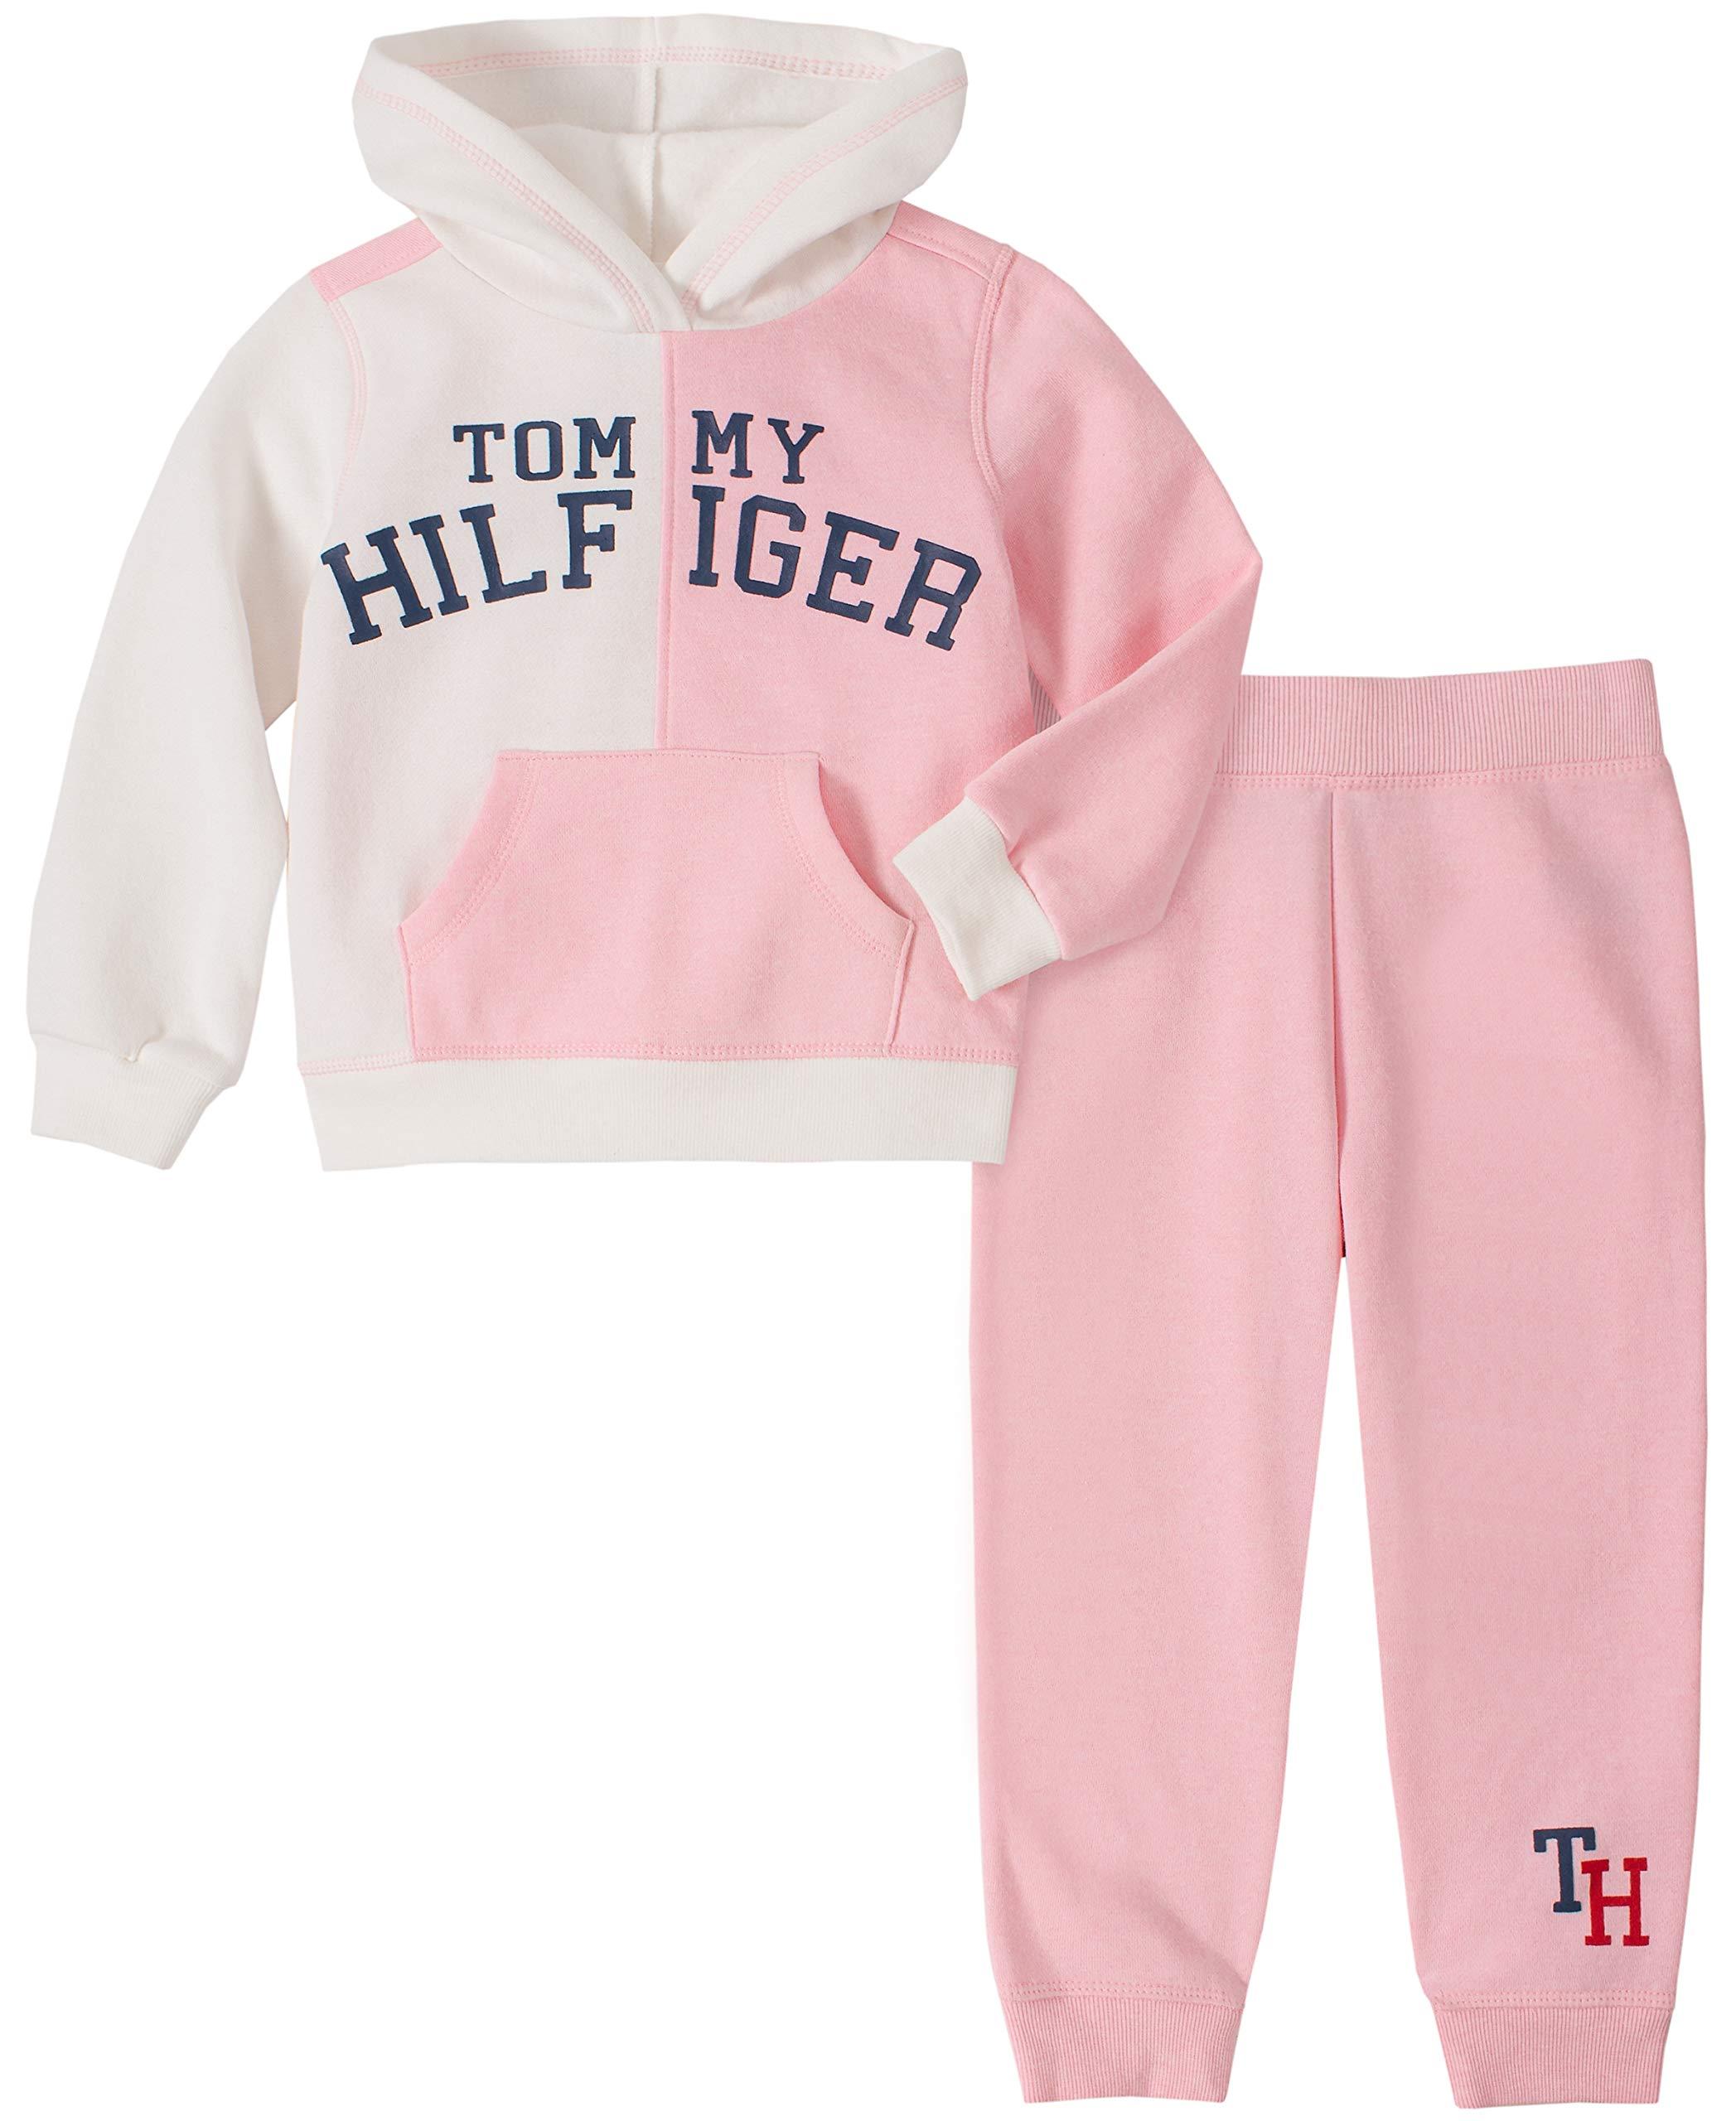 Tommy Hilfiger Girls' 2 Pieces Jog Set